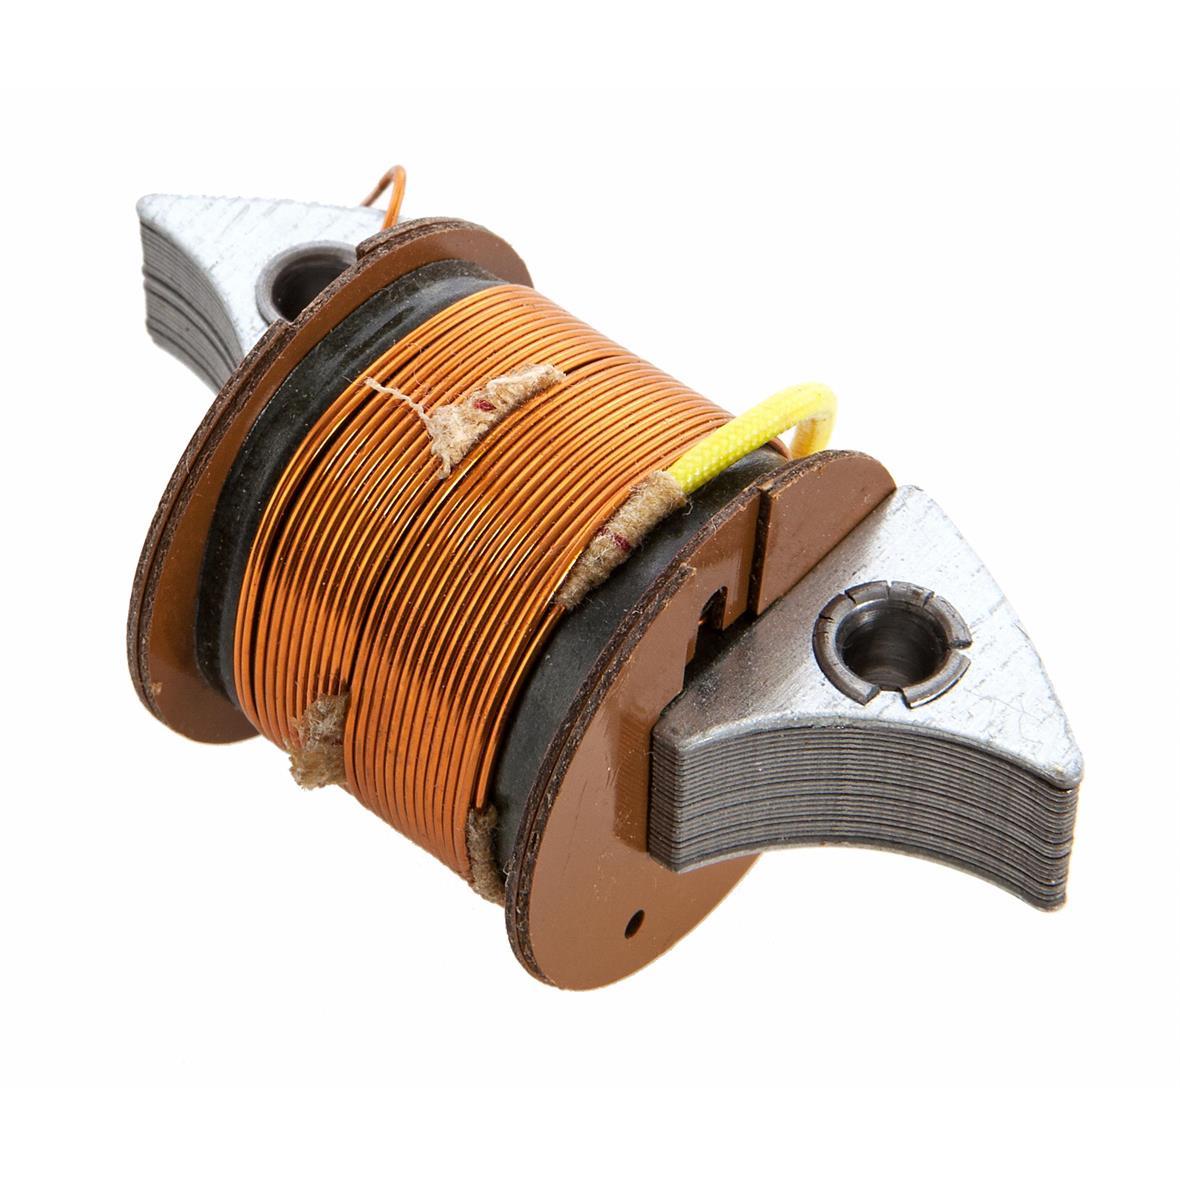 Supply Coil Flywheel 1° lighting coil | SIP-Scootershop